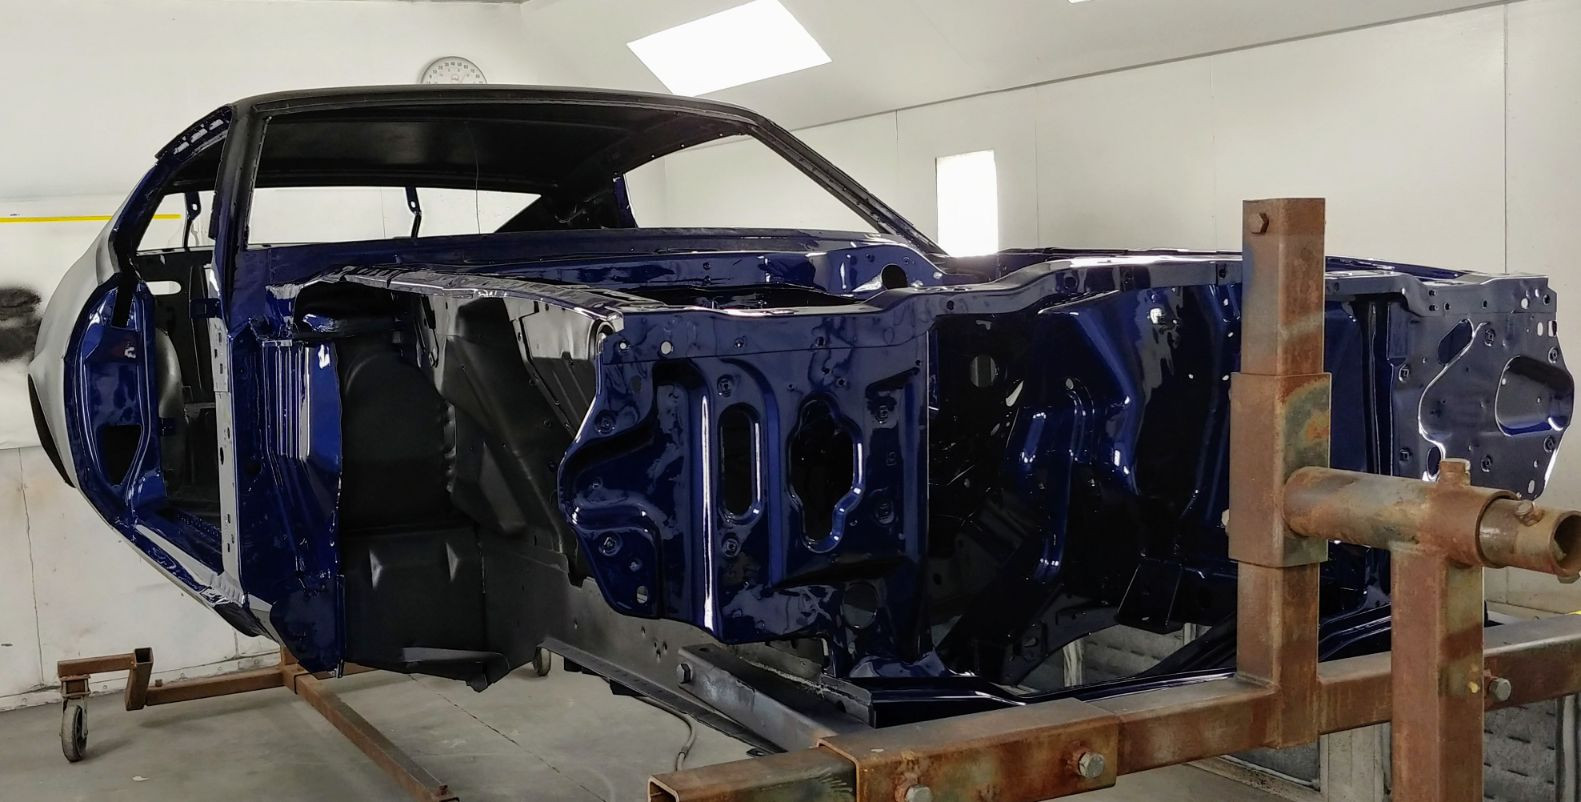 1973 Mustang - Restored Body